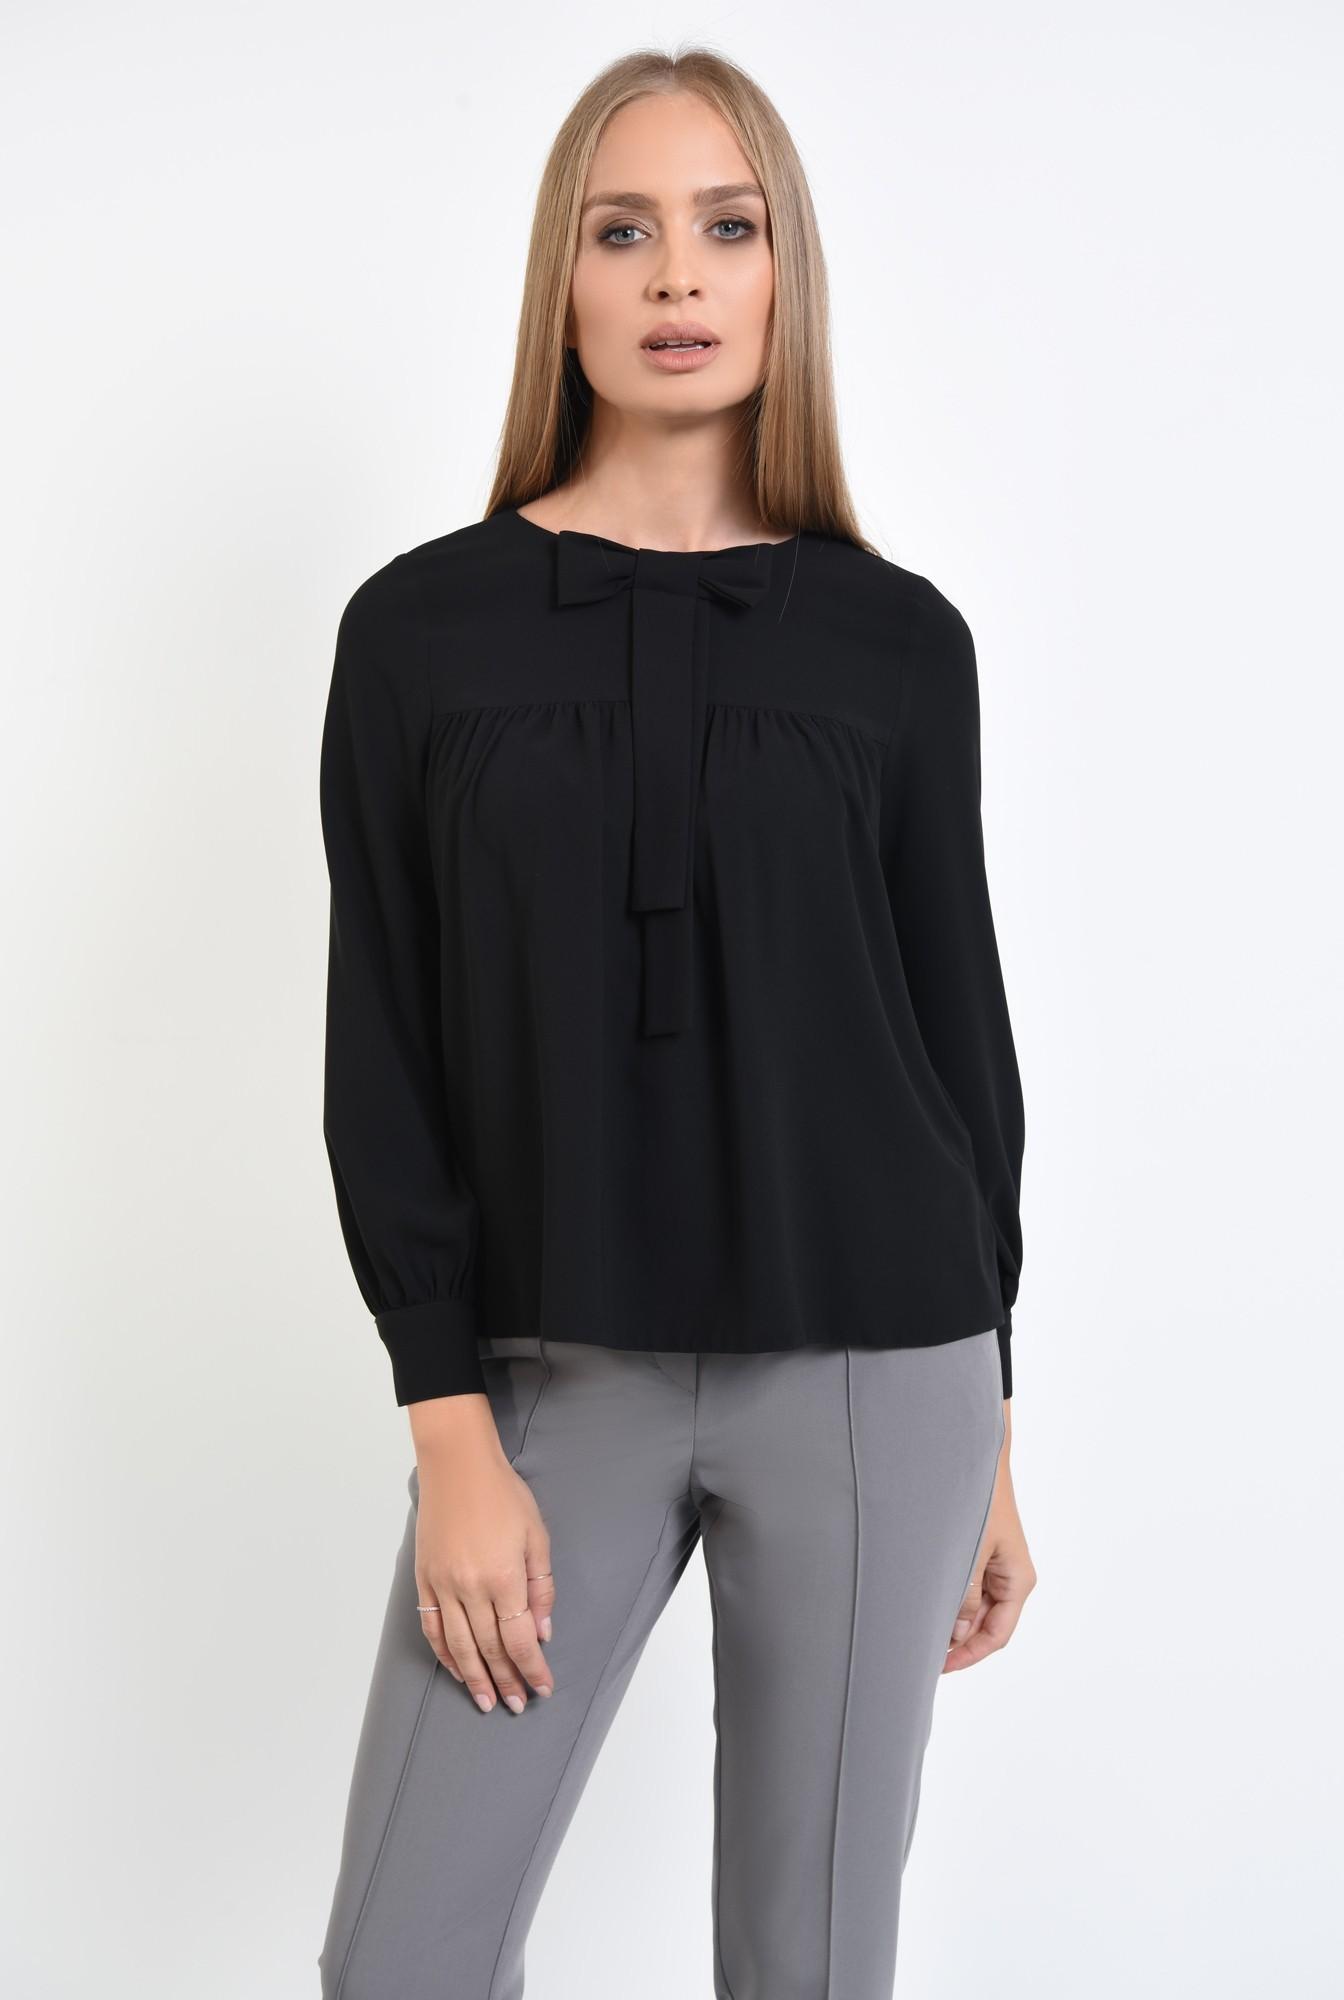 2 - Bluza casual, negru, croi lejer, funda la gat